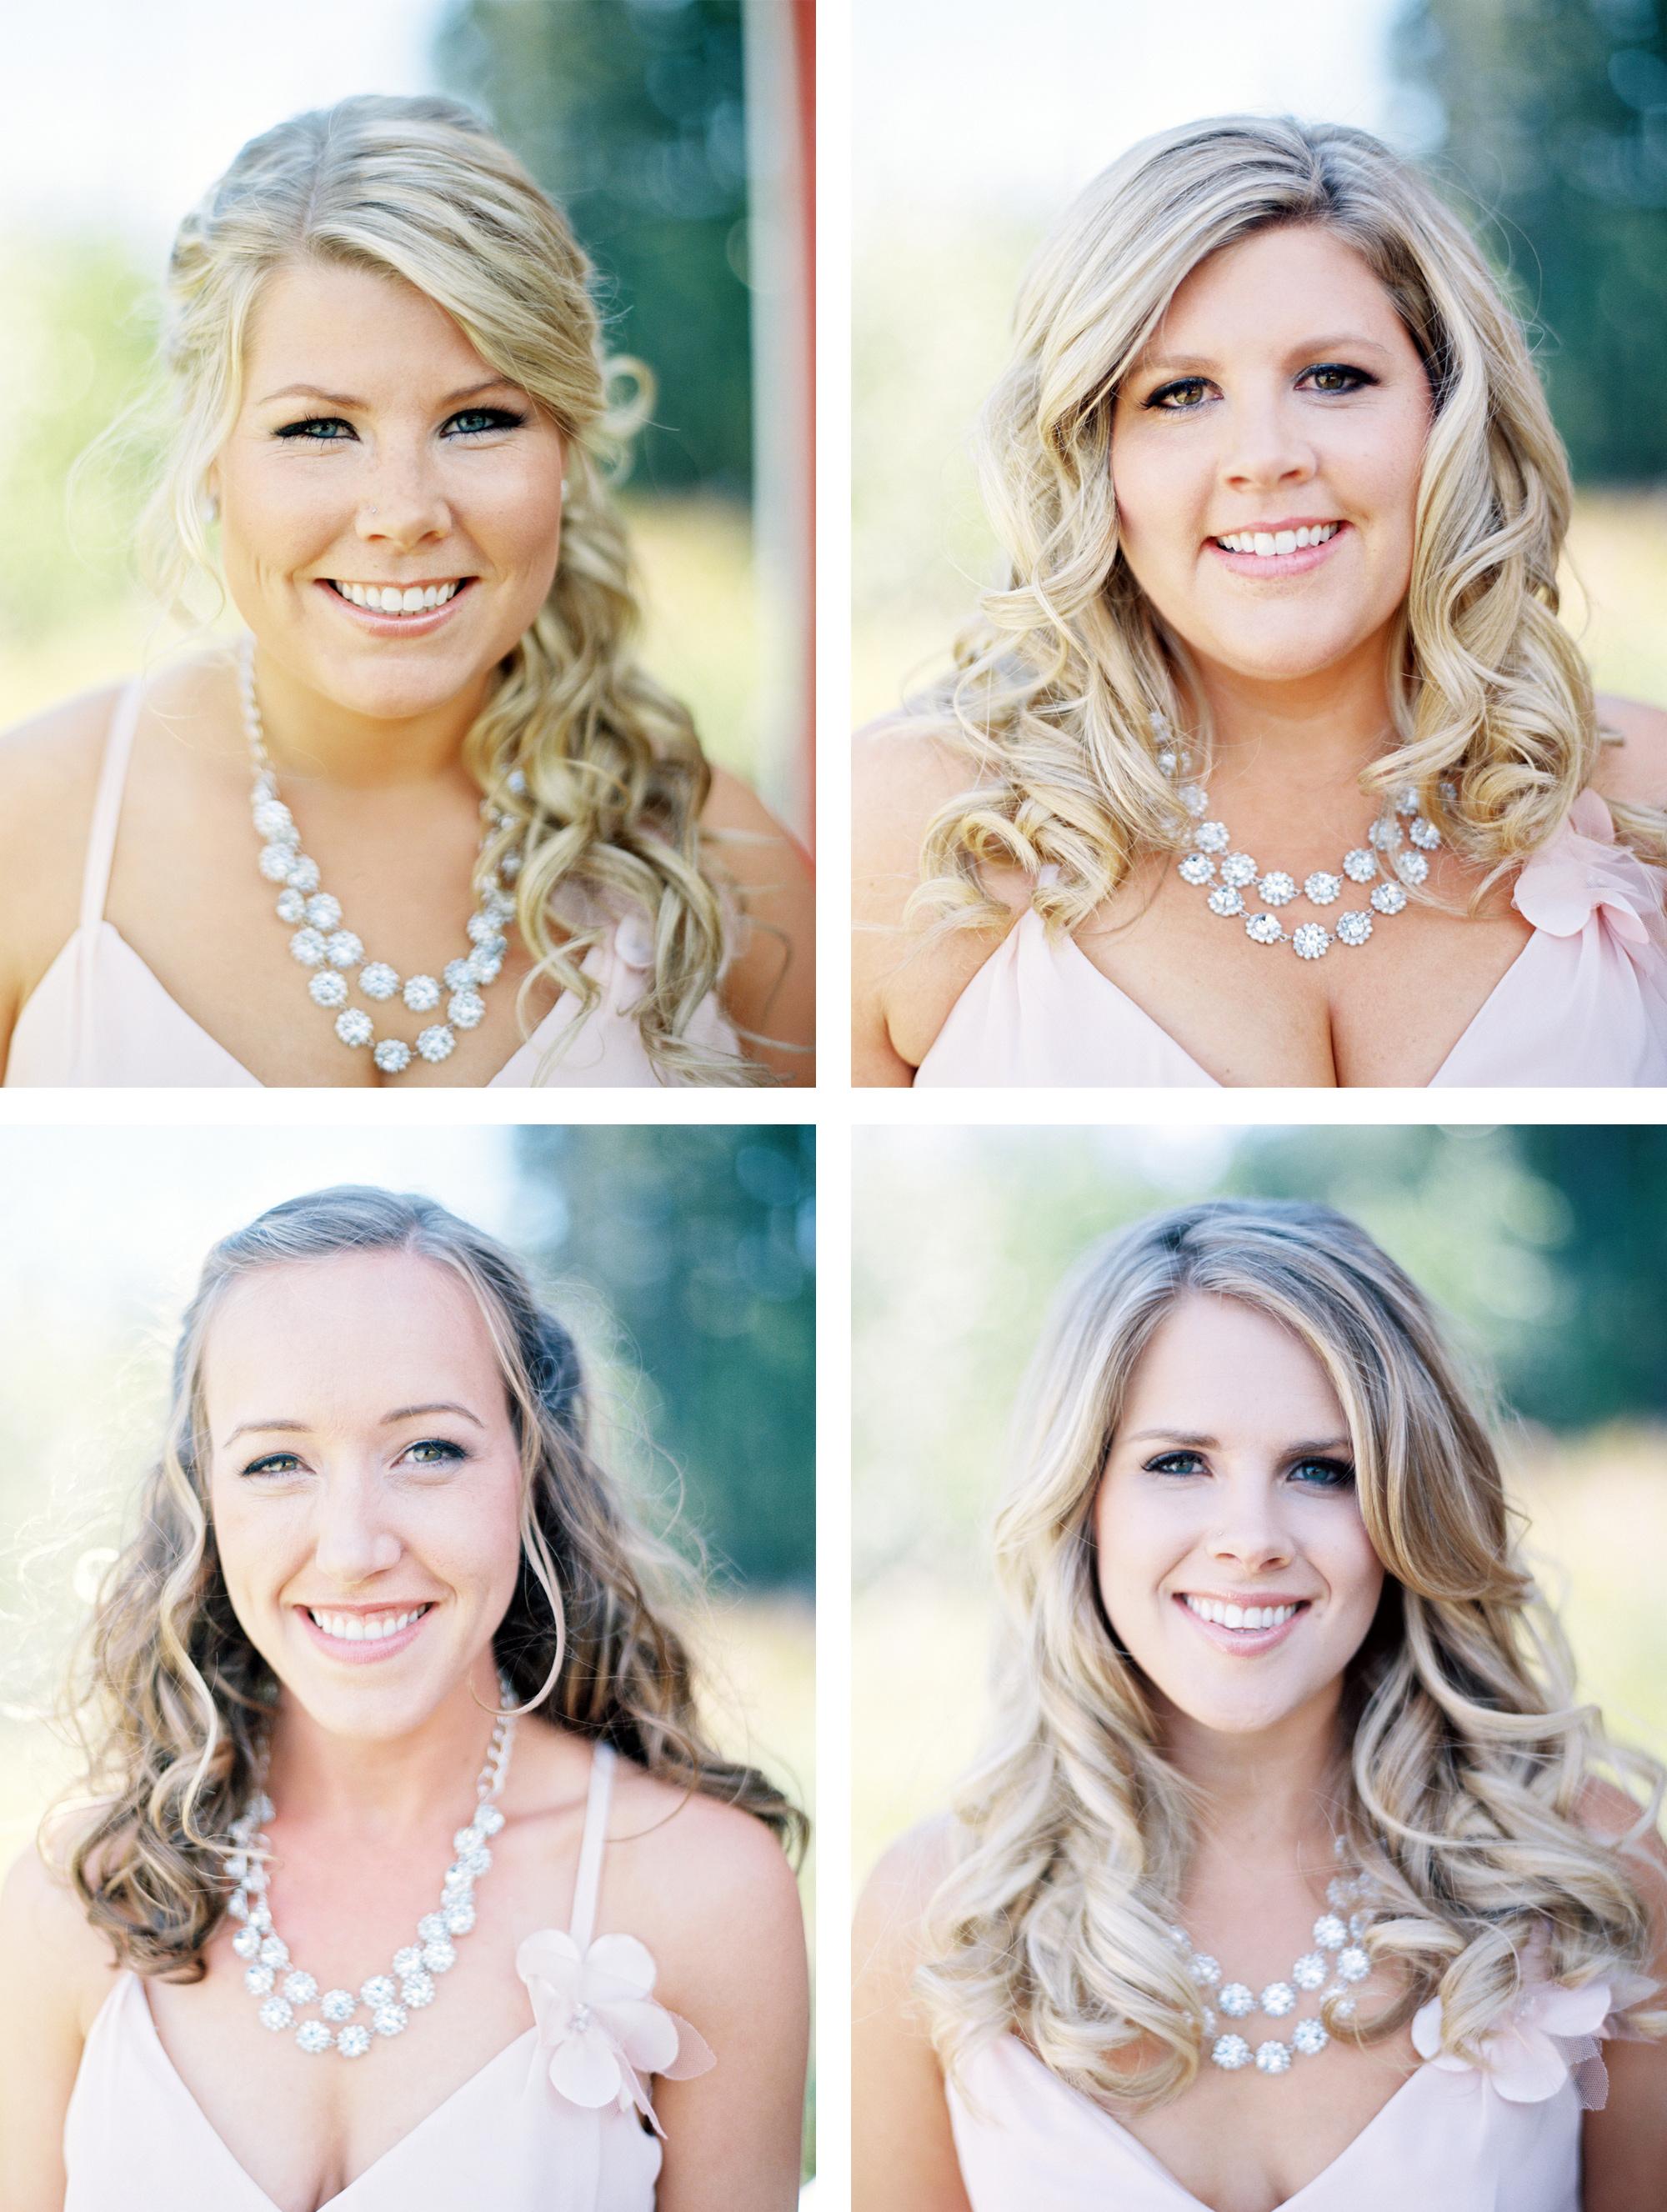 Portraits of bridesmaids